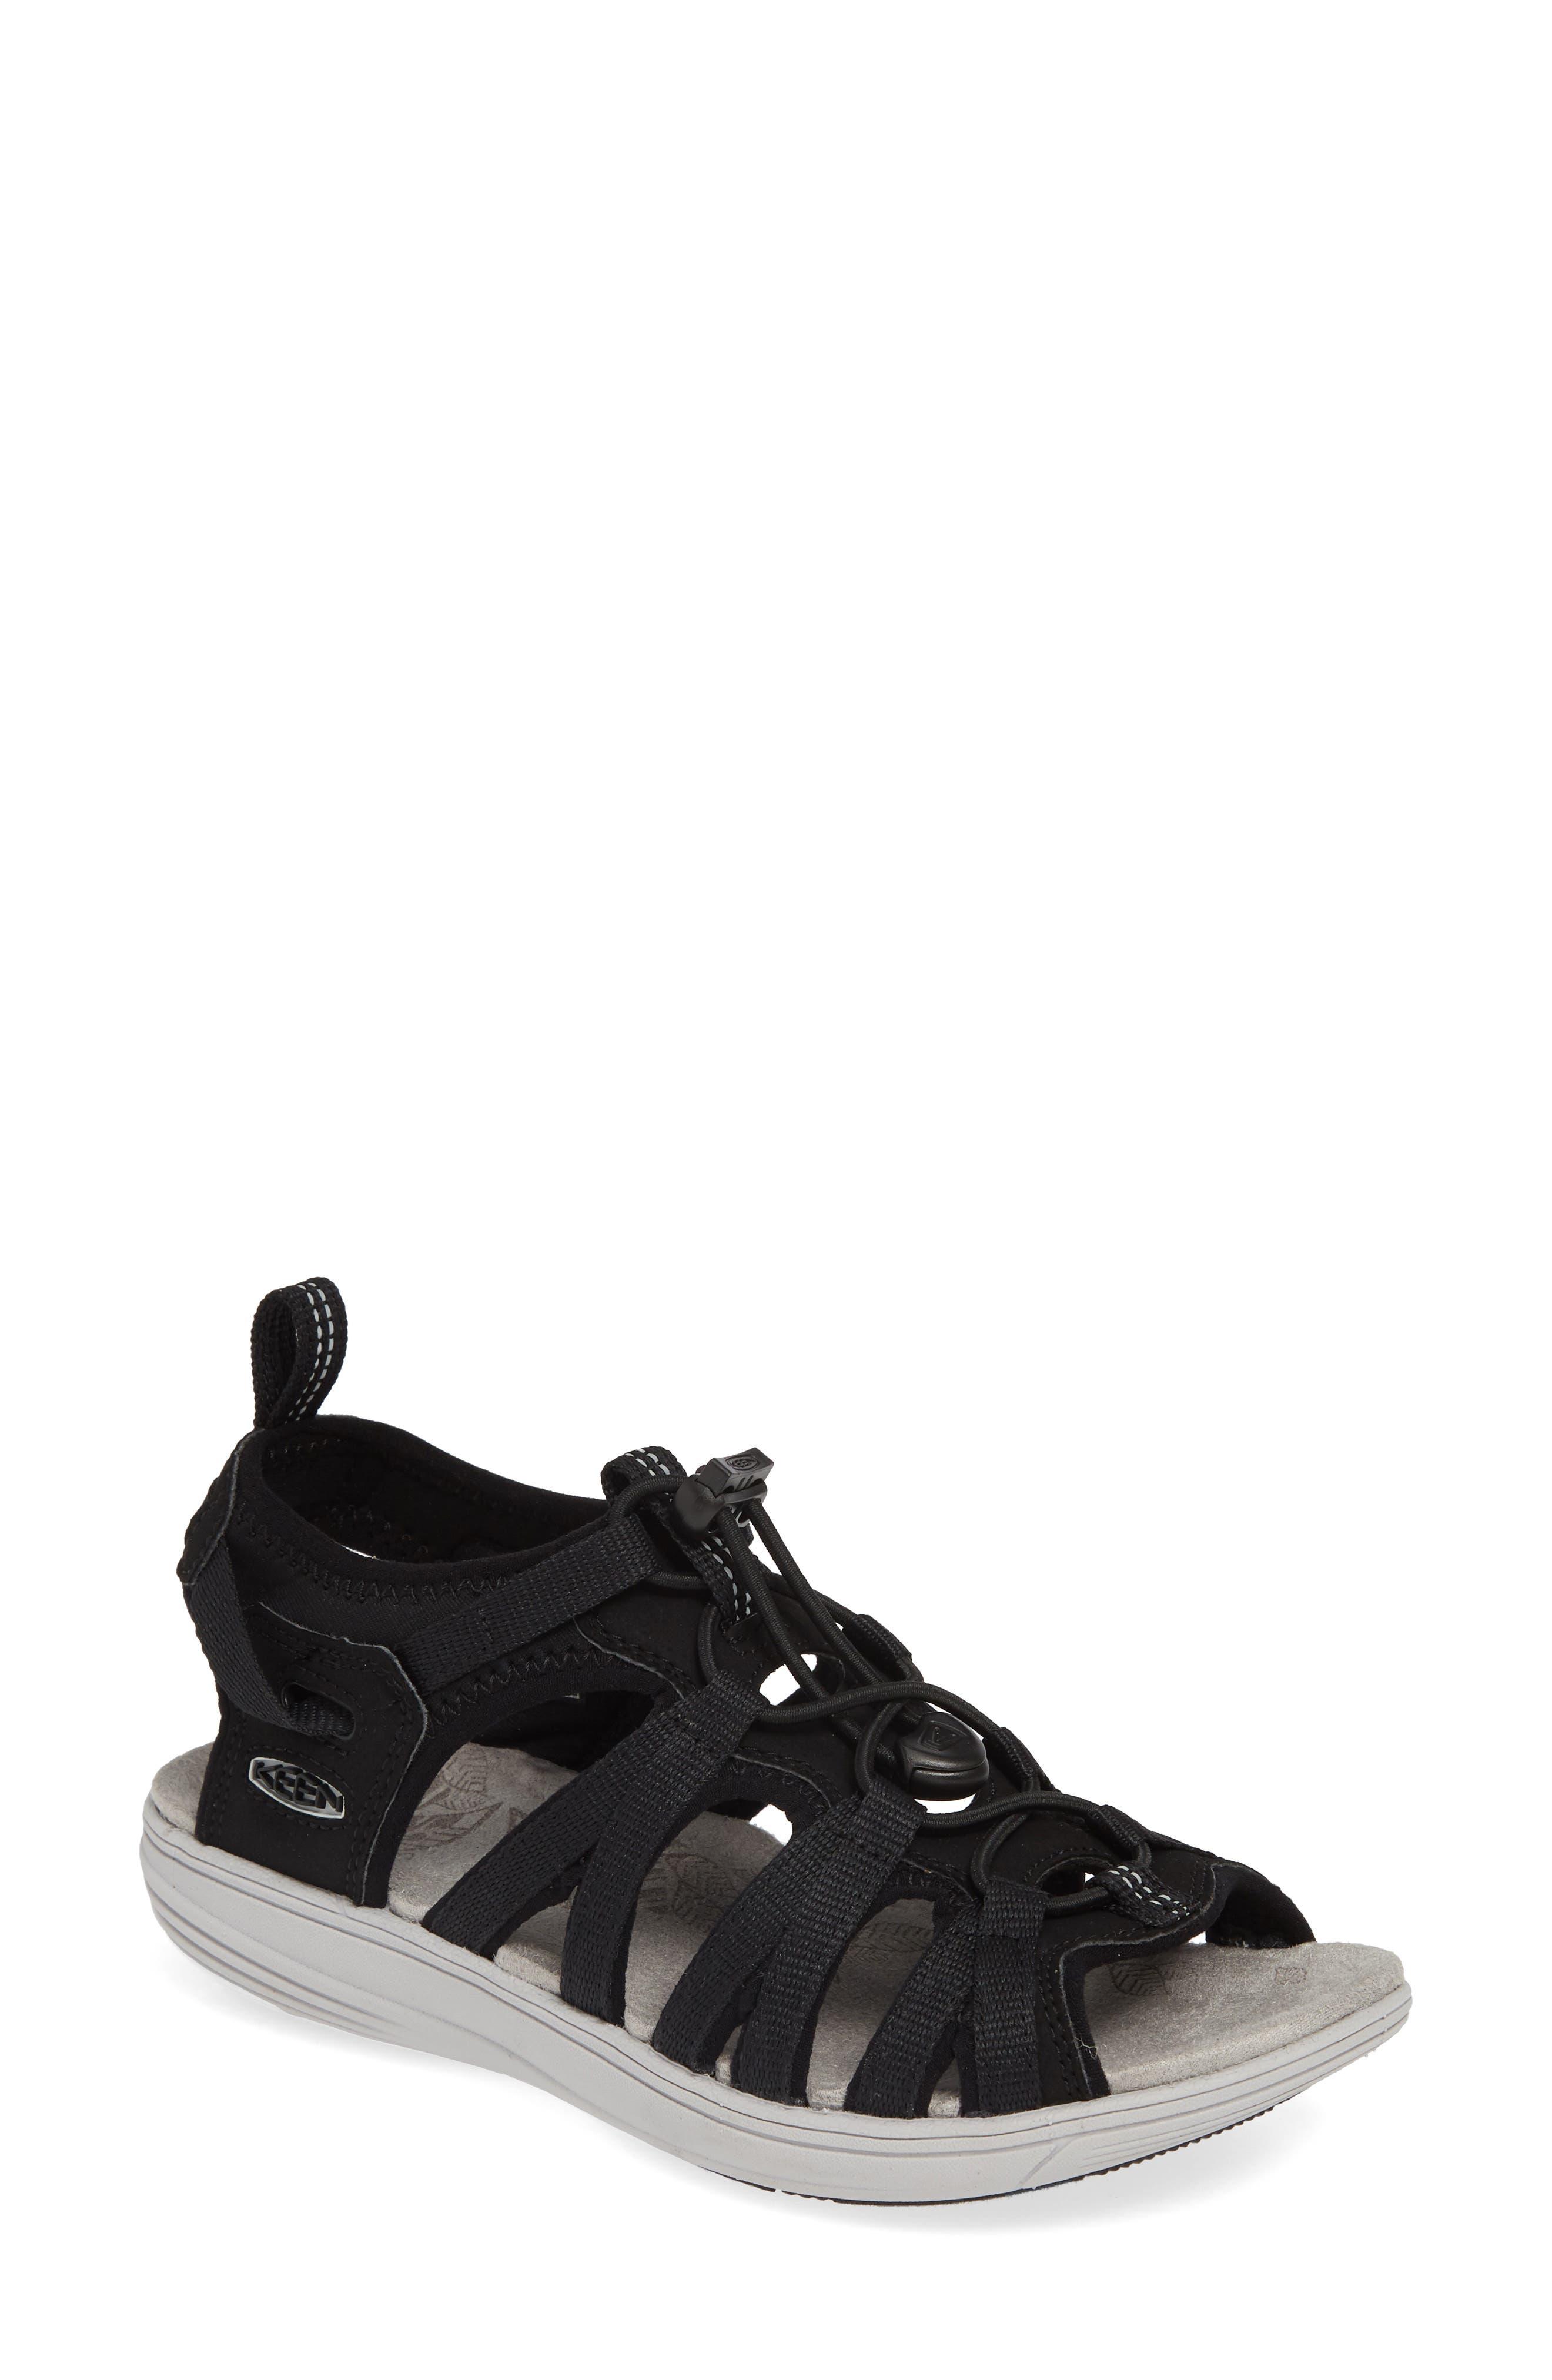 KEEN, Damaya Lattice Sandal, Main thumbnail 1, color, BLACK/ VAPOR FABRIC